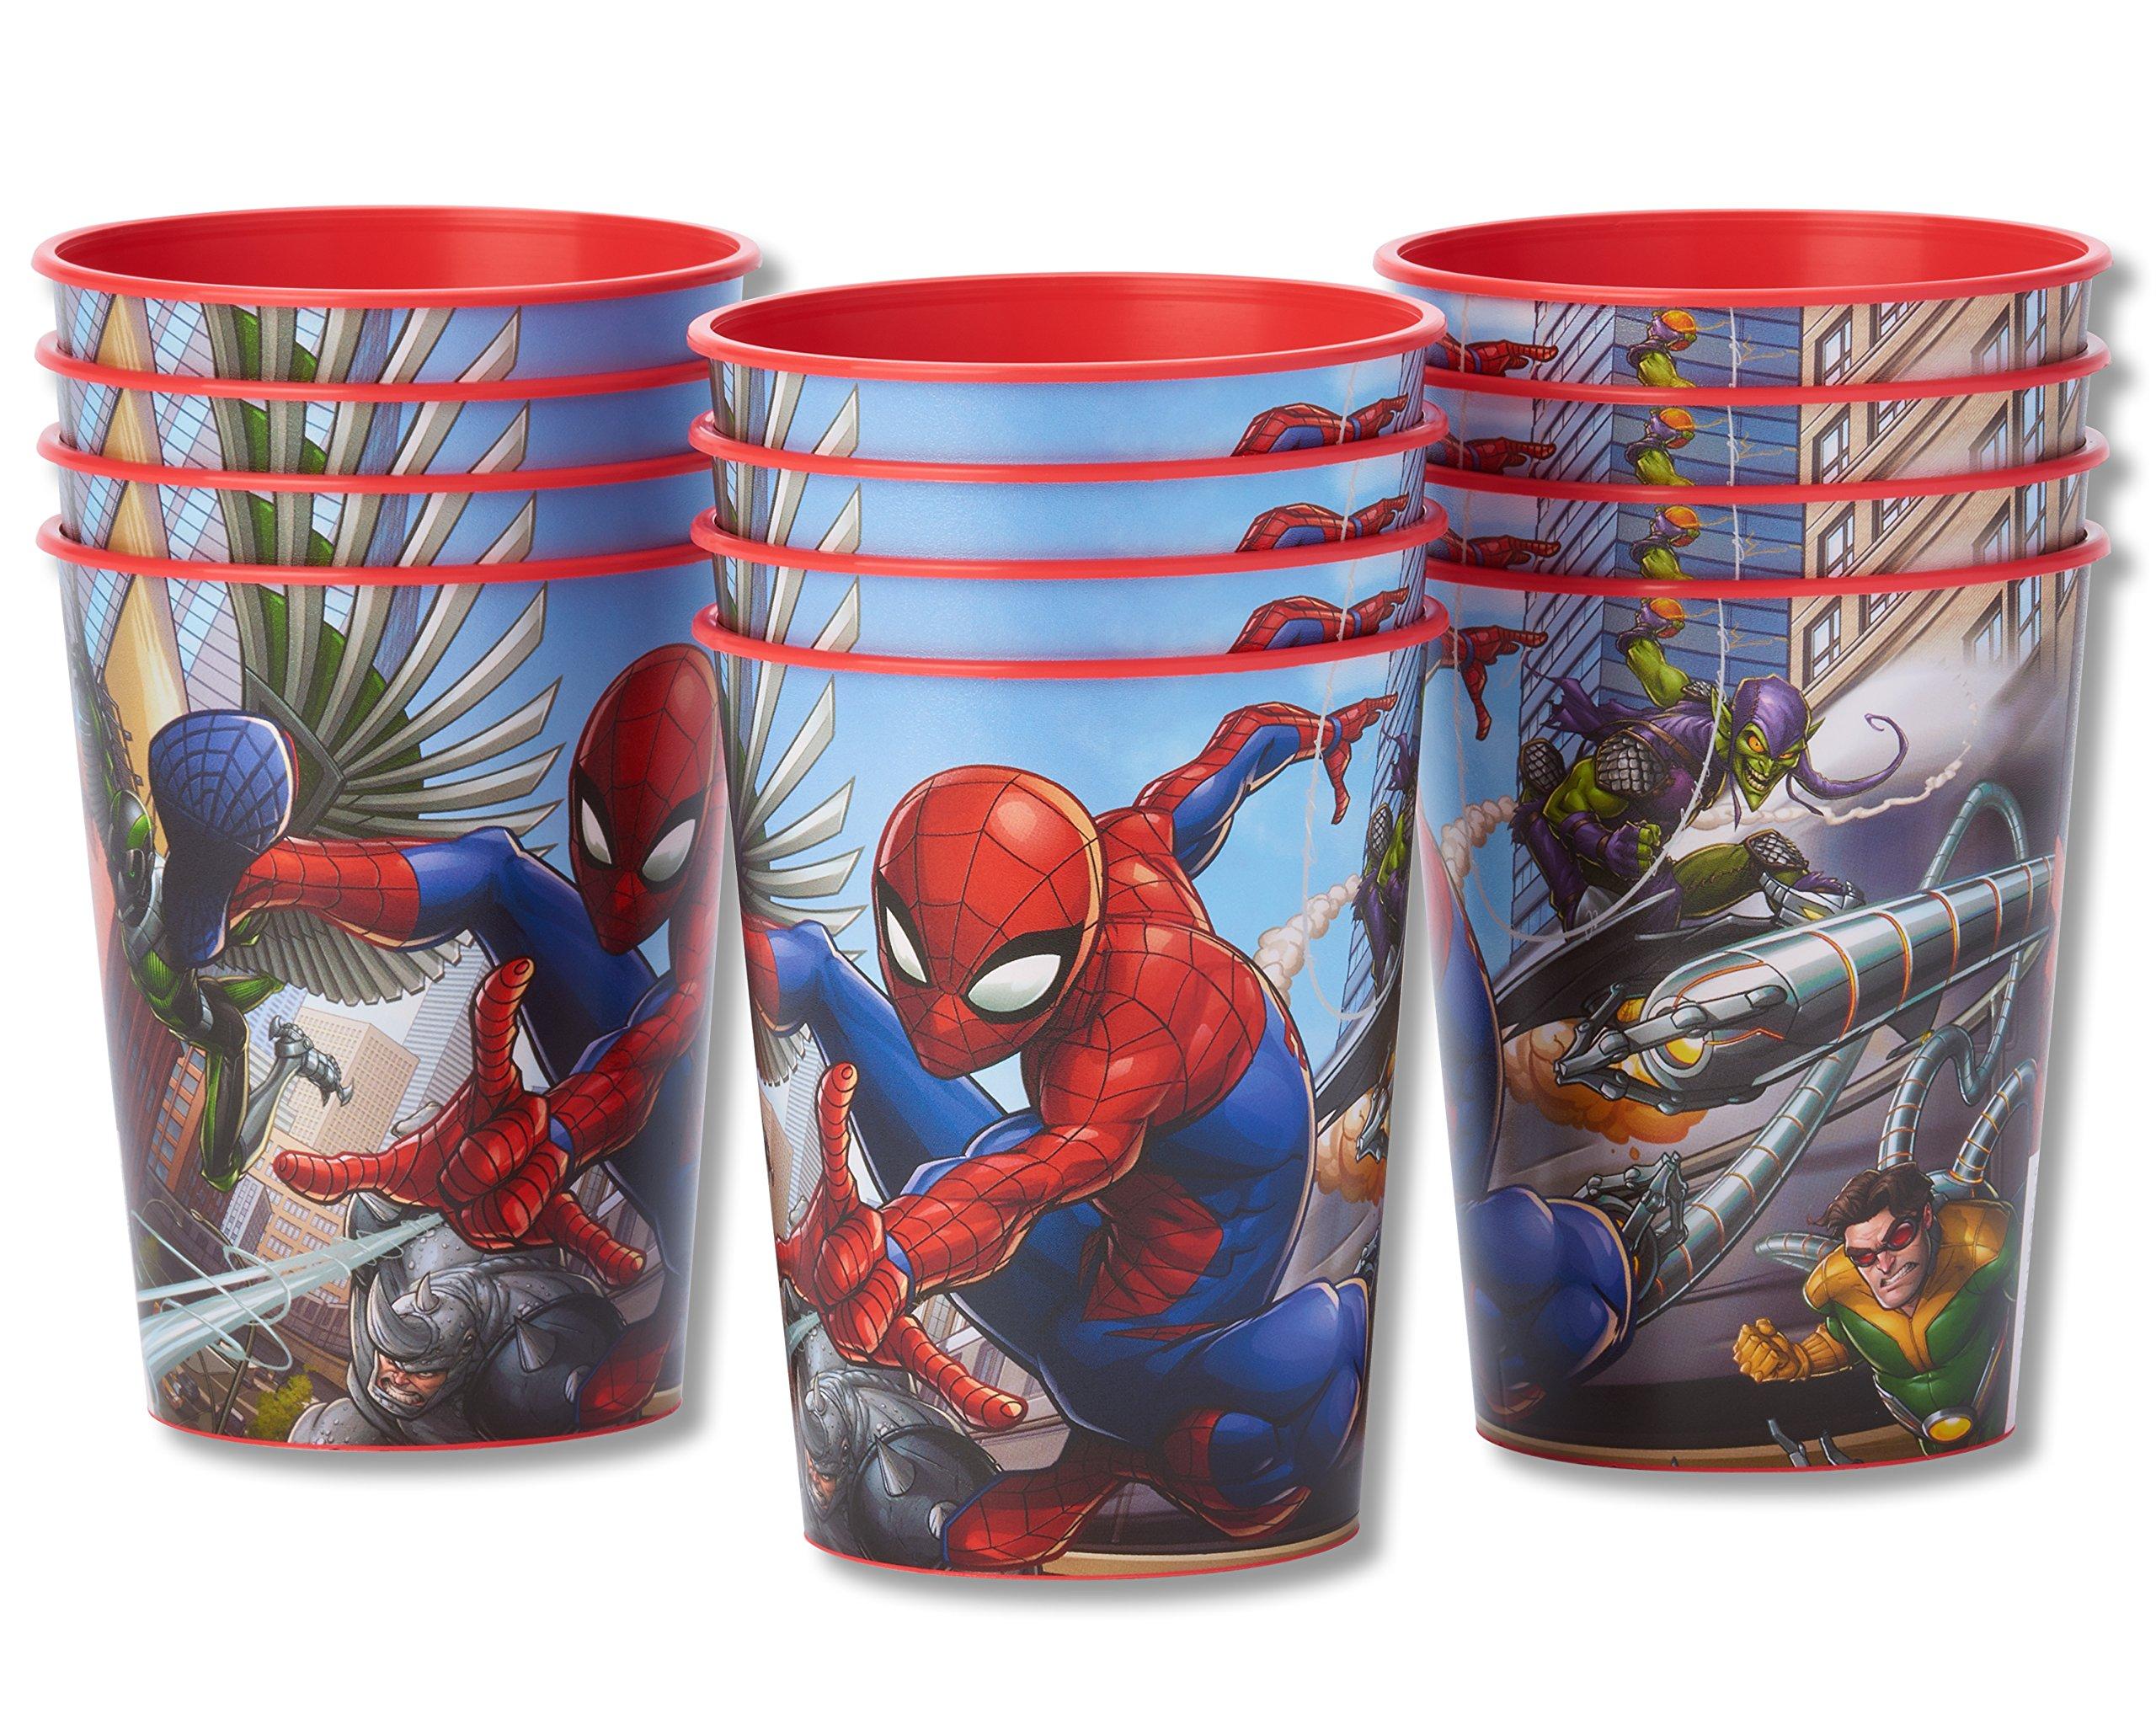 American Greetings Spider-Man Plastic Cups Partyplastic, 16 Oz